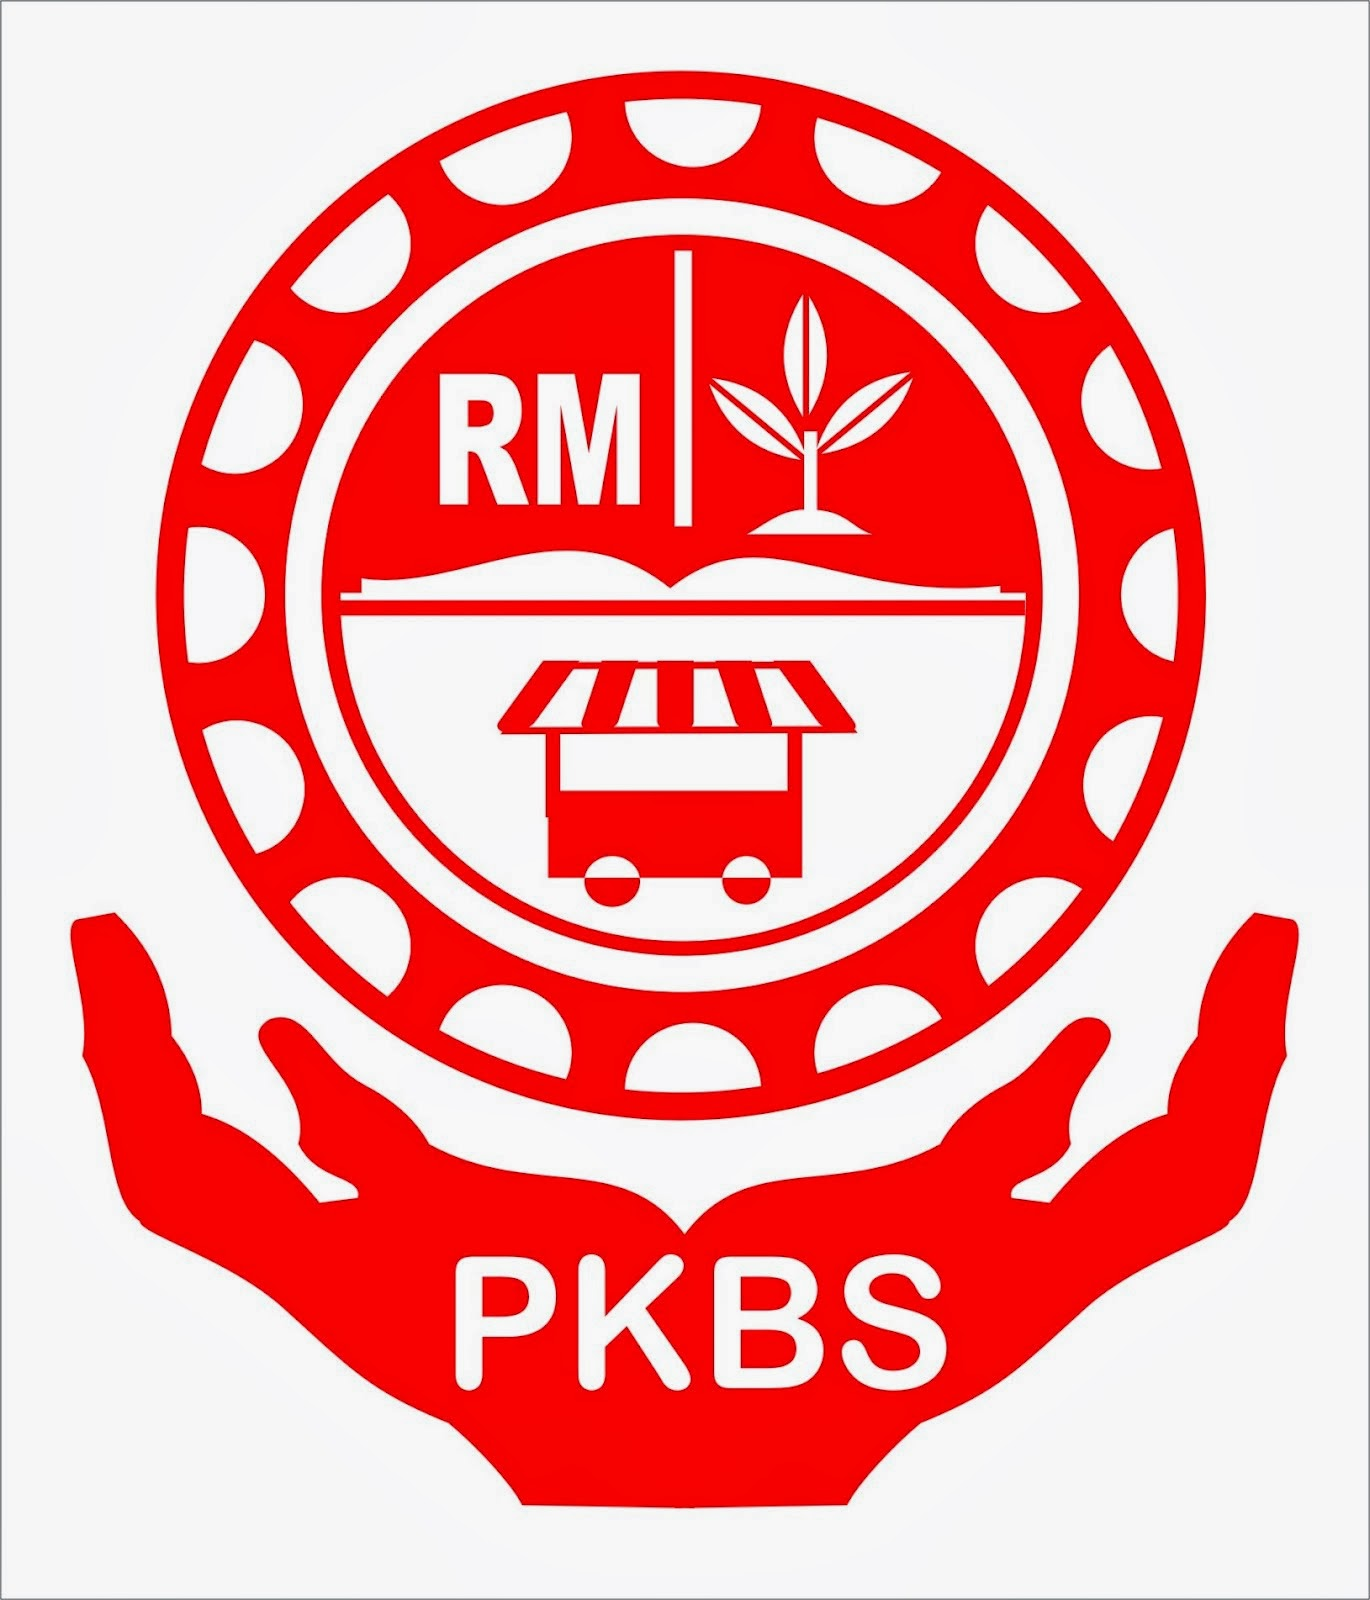 logo pkbs